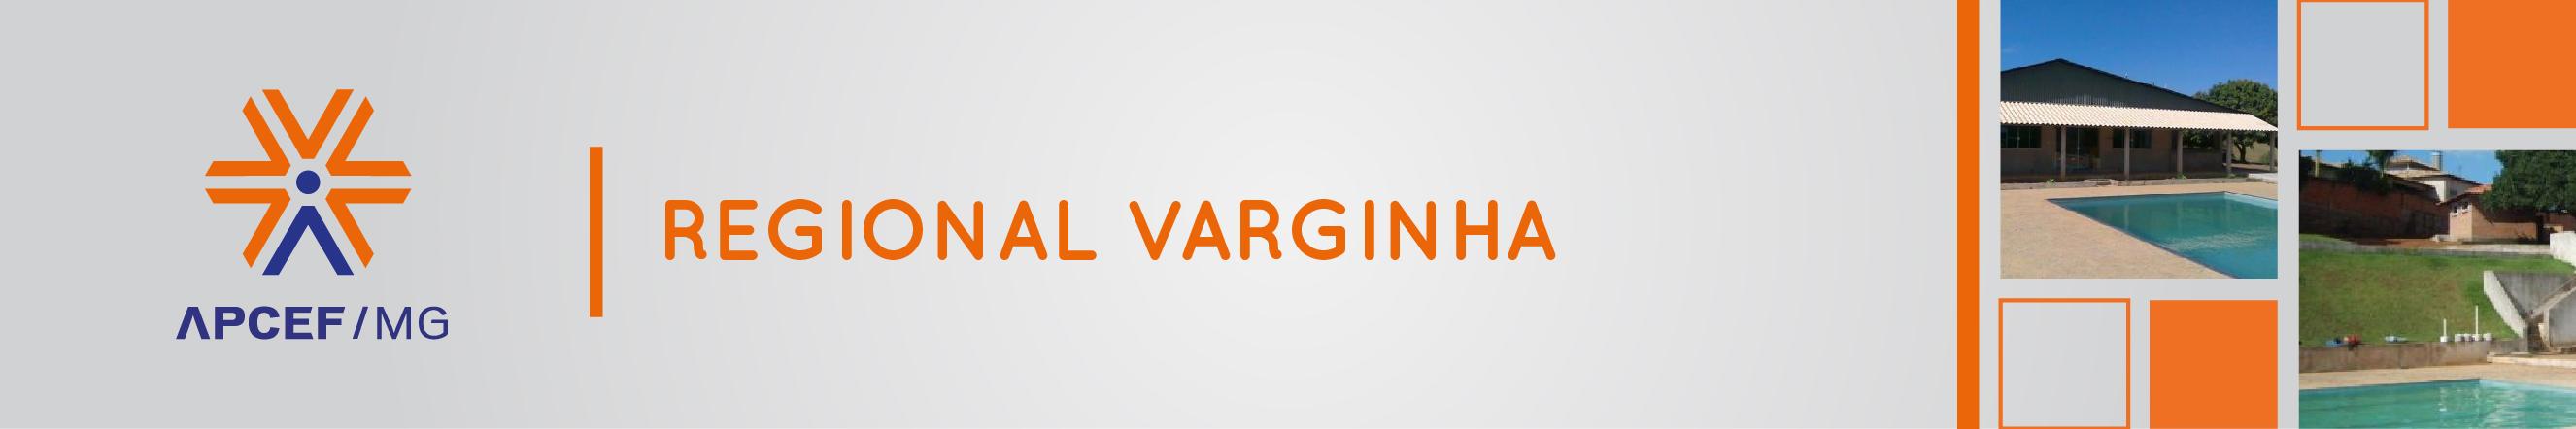 barra-superior-regional-varginha